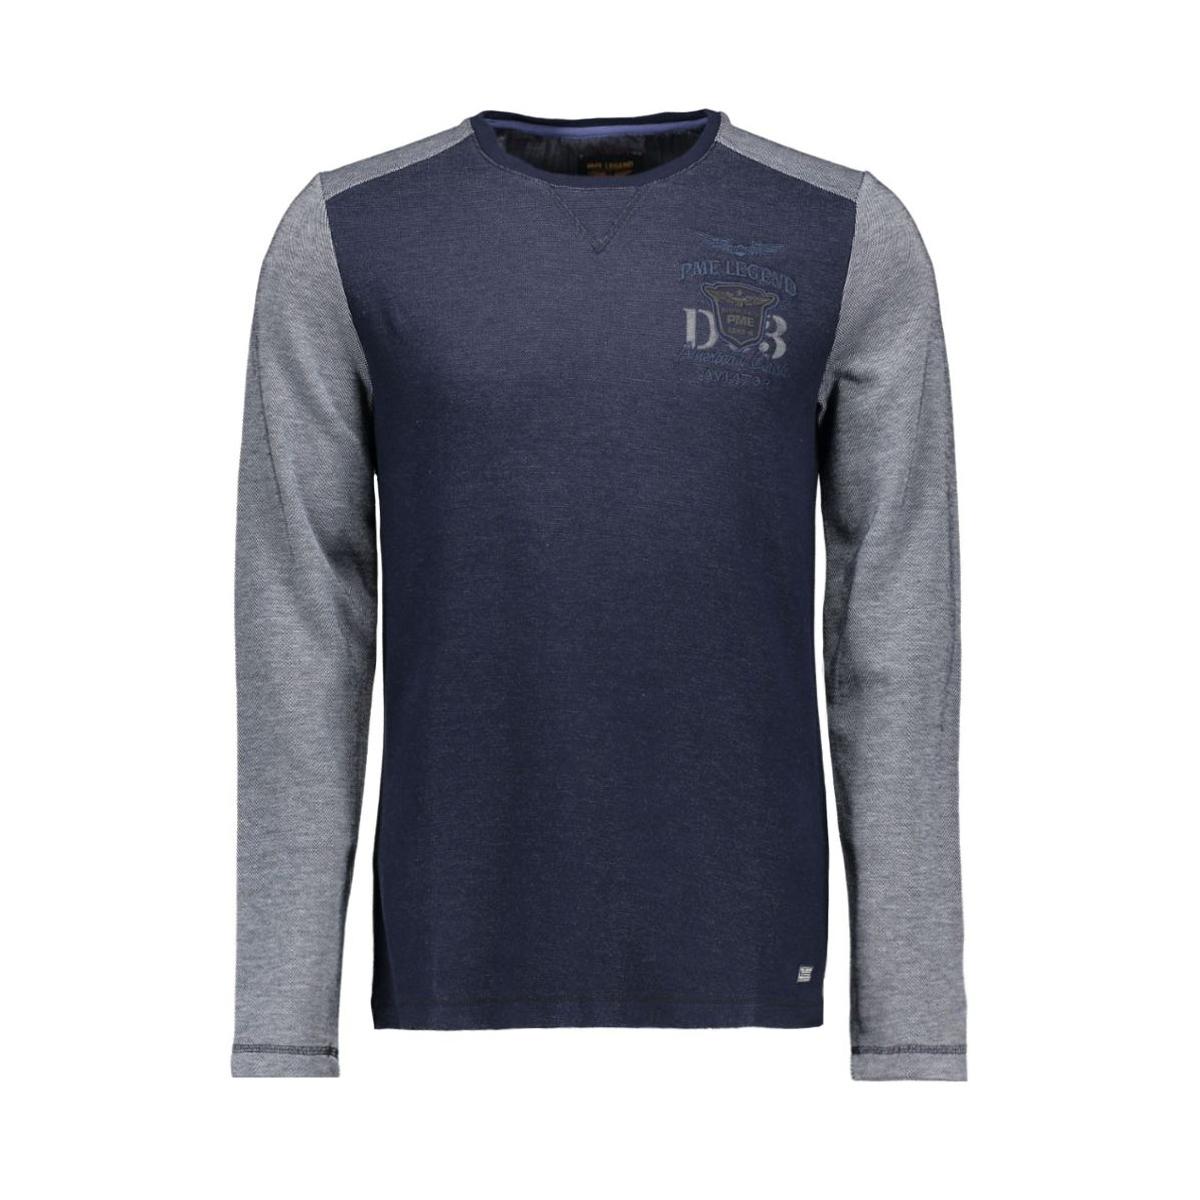 pts65518 pme legend sweater 5550